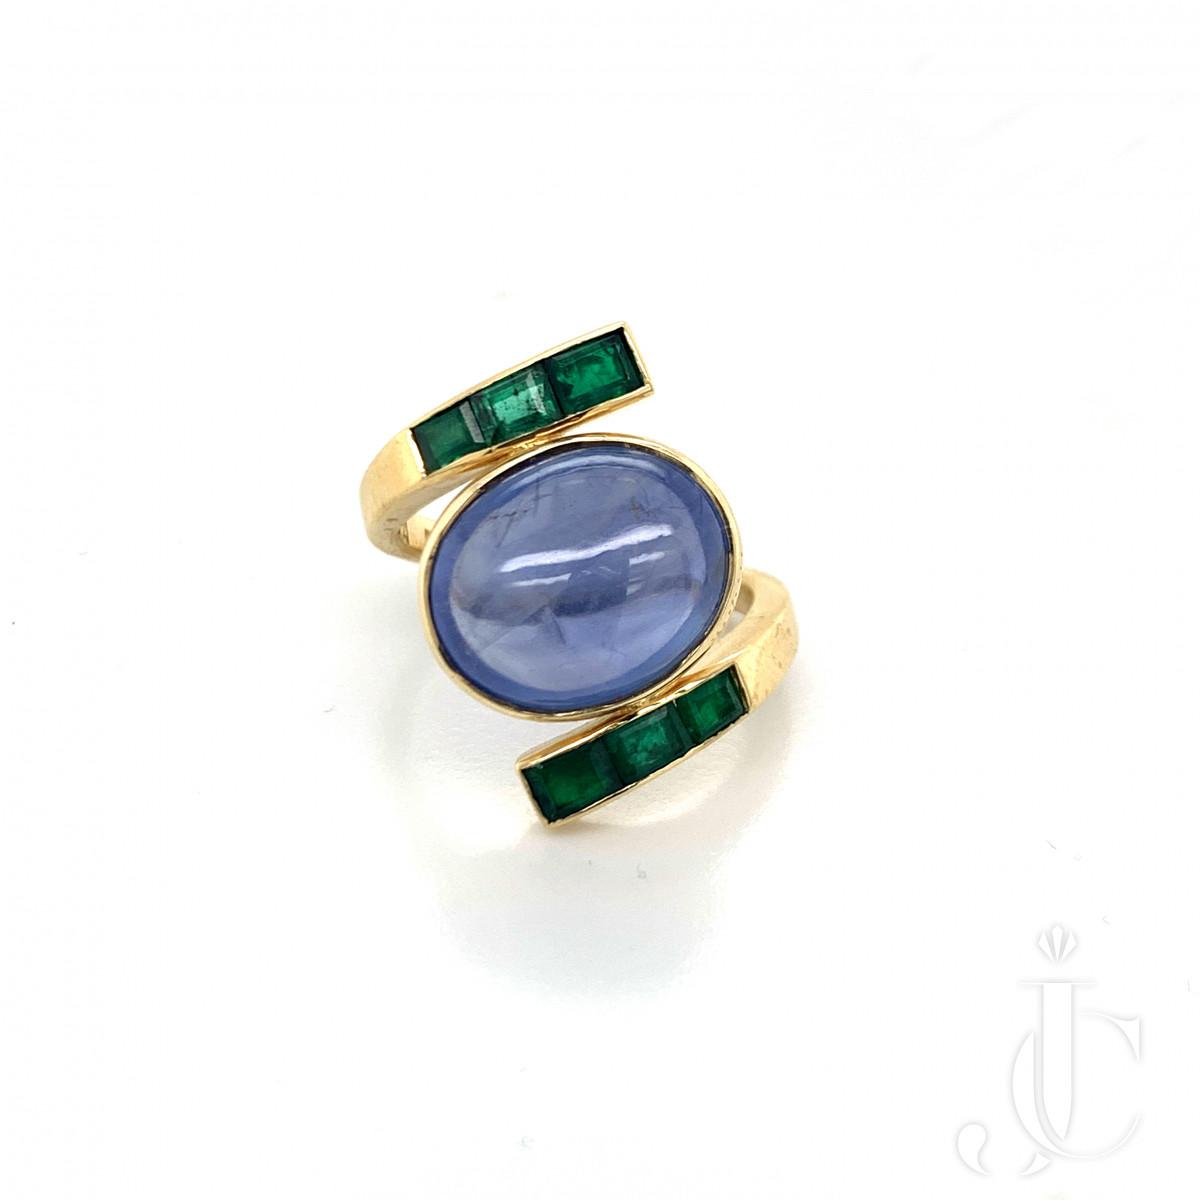 Grima Sapphire 18kt yg Ring